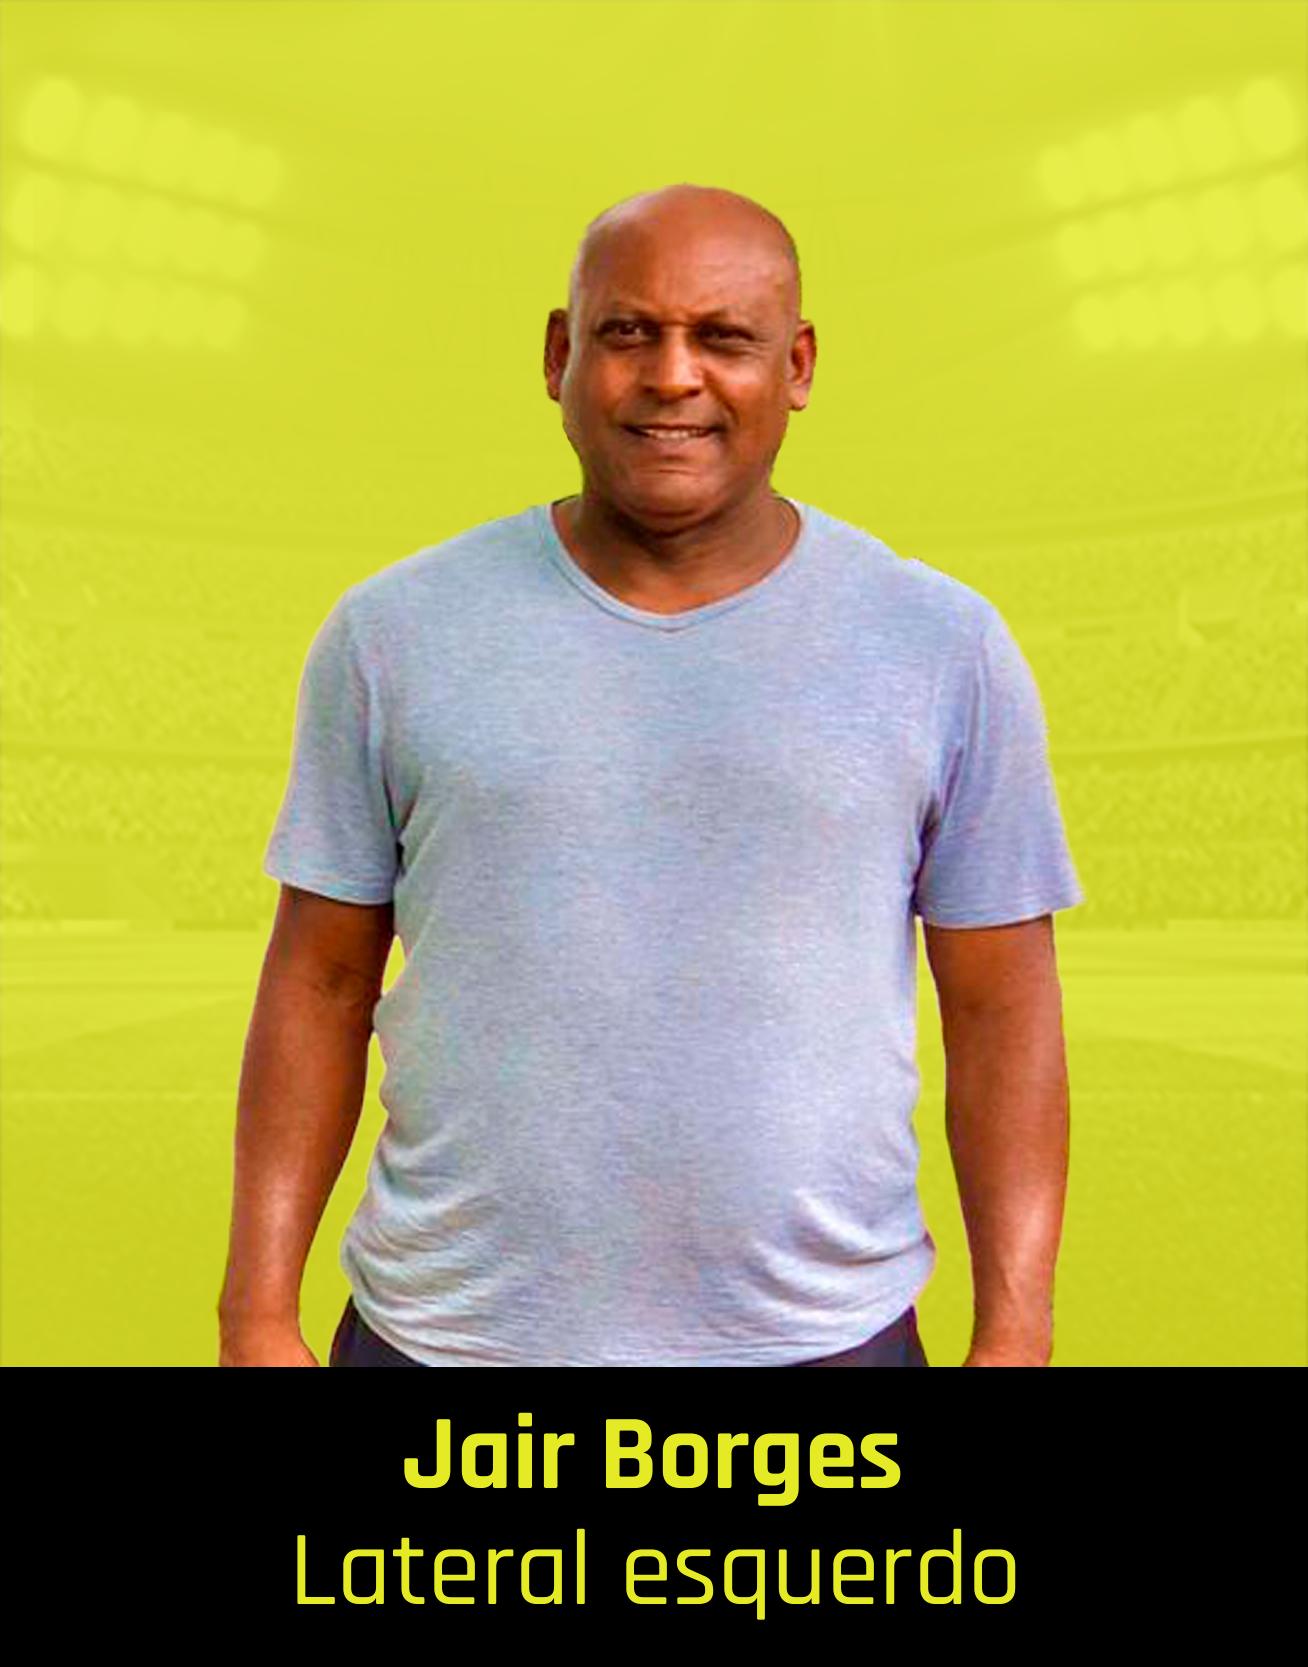 Jair Borges